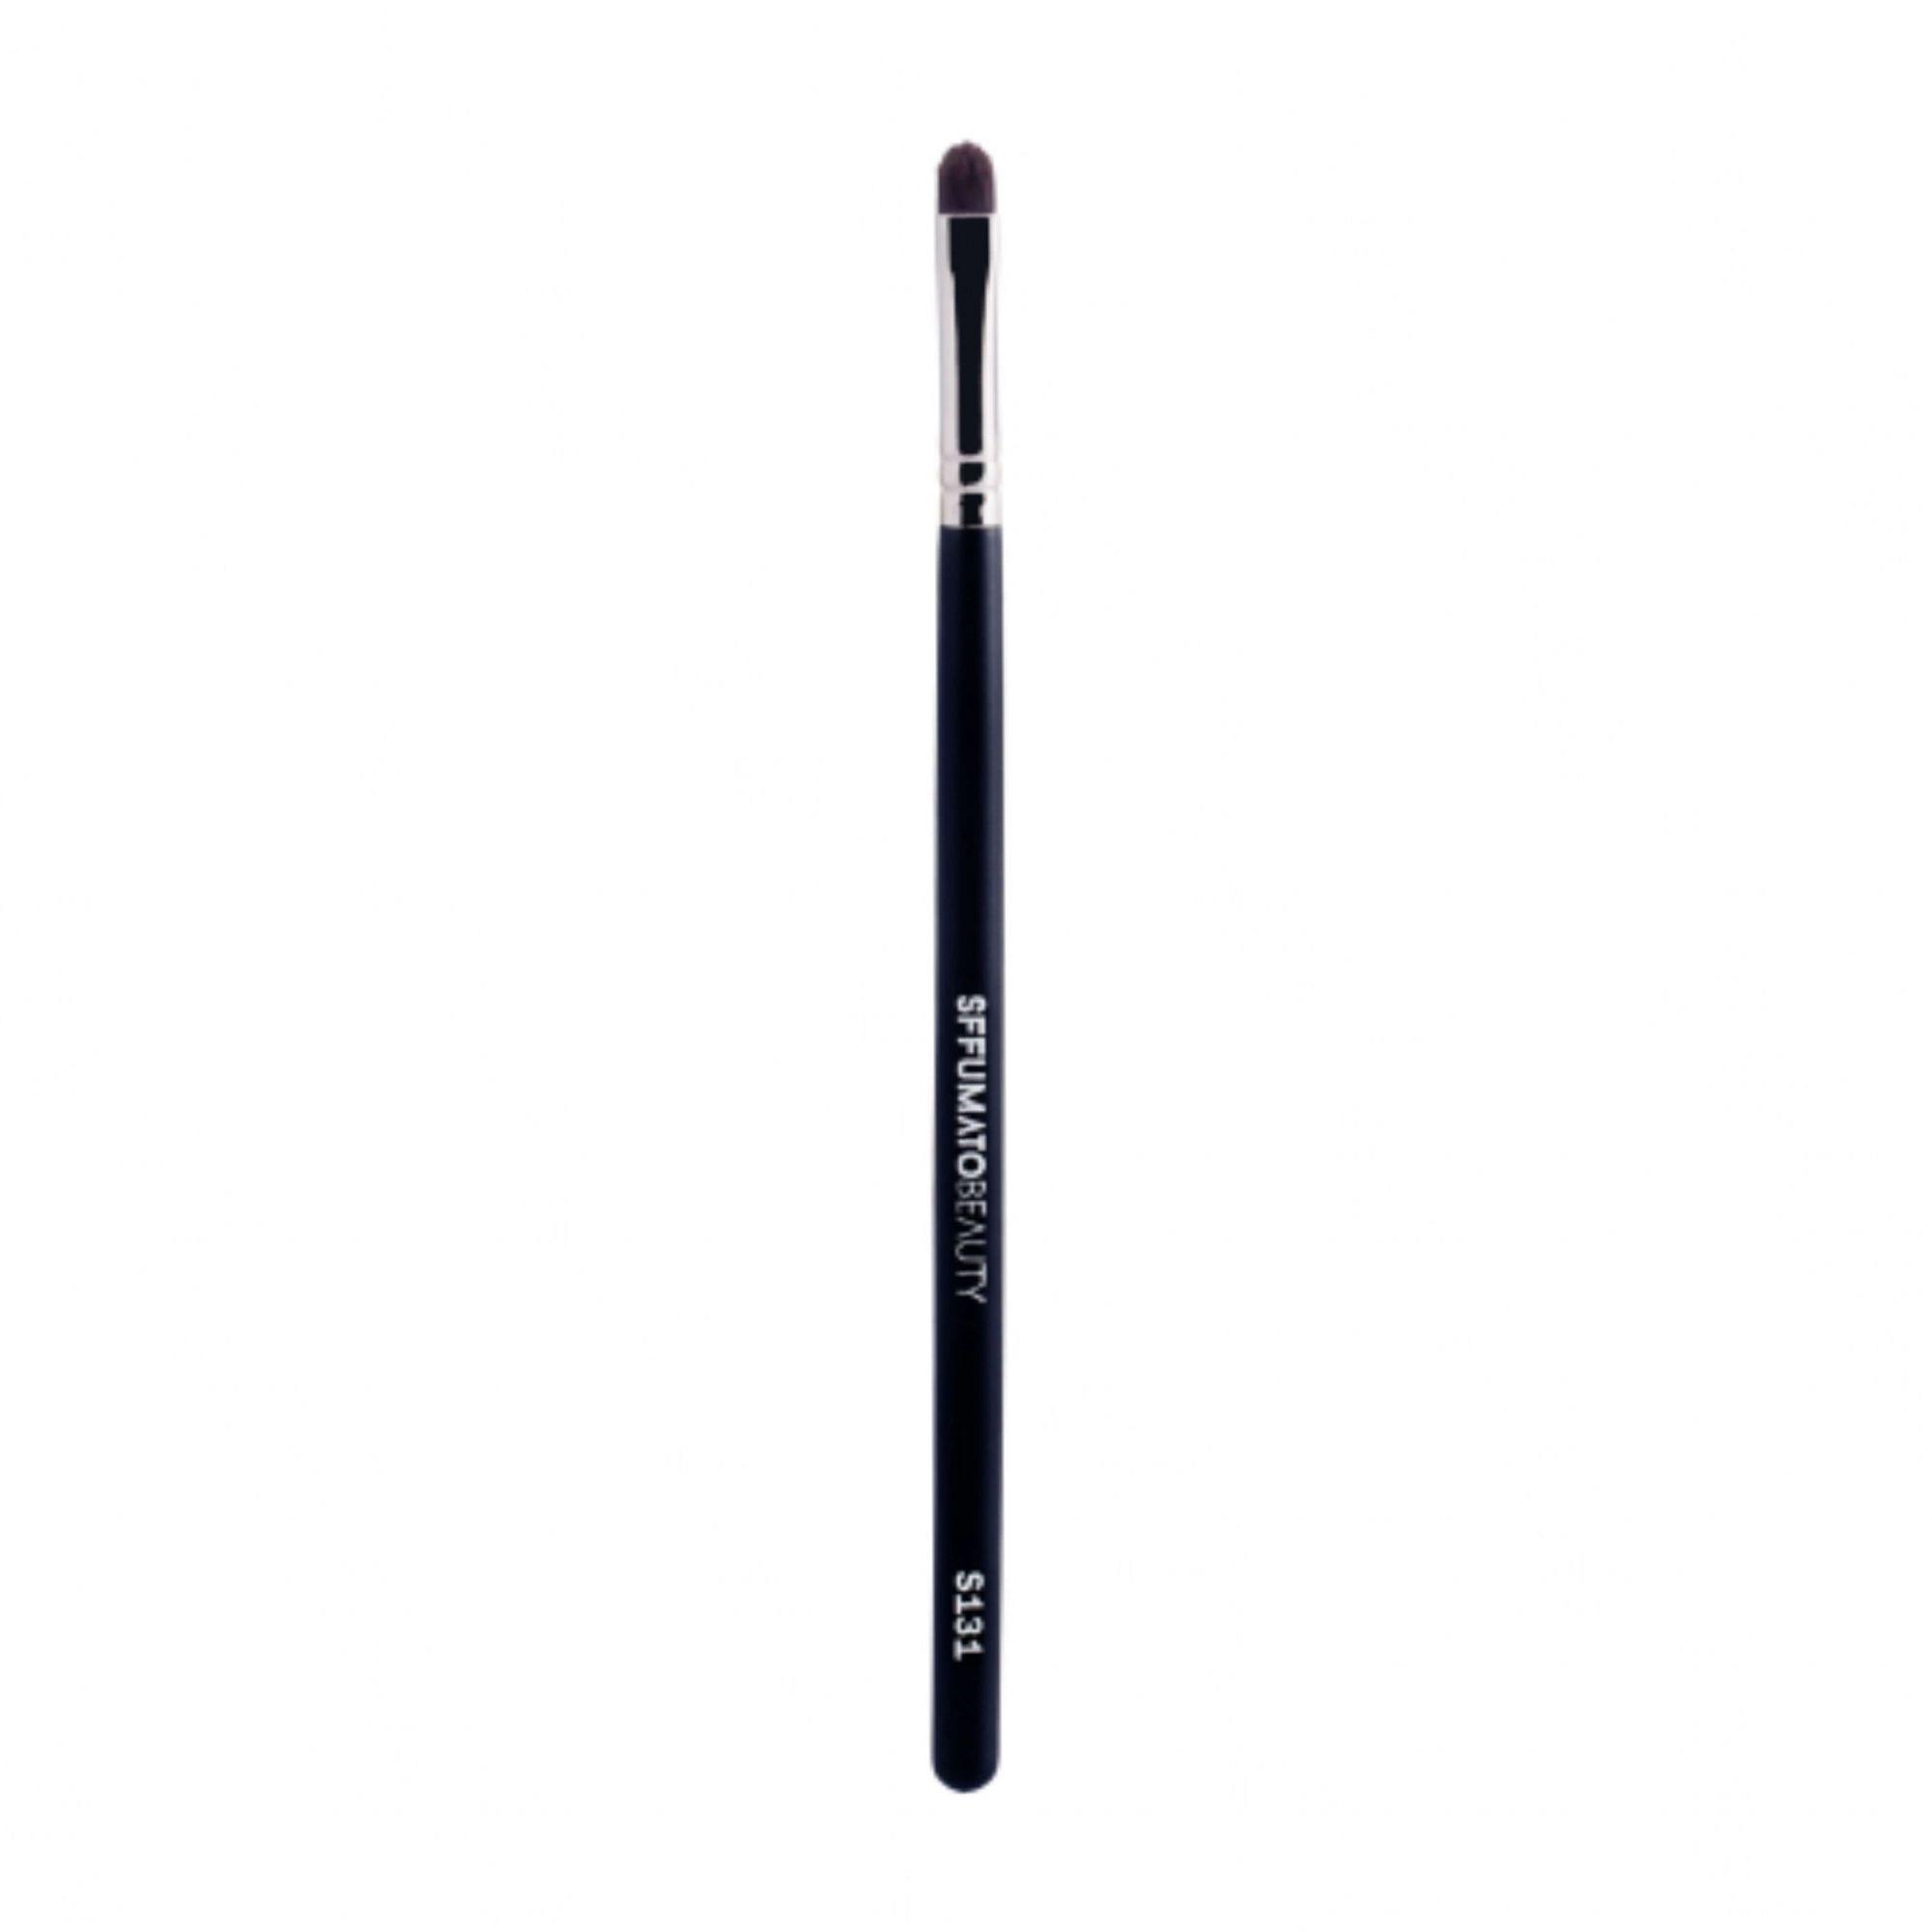 Pincel S131 Sffumato Beauty